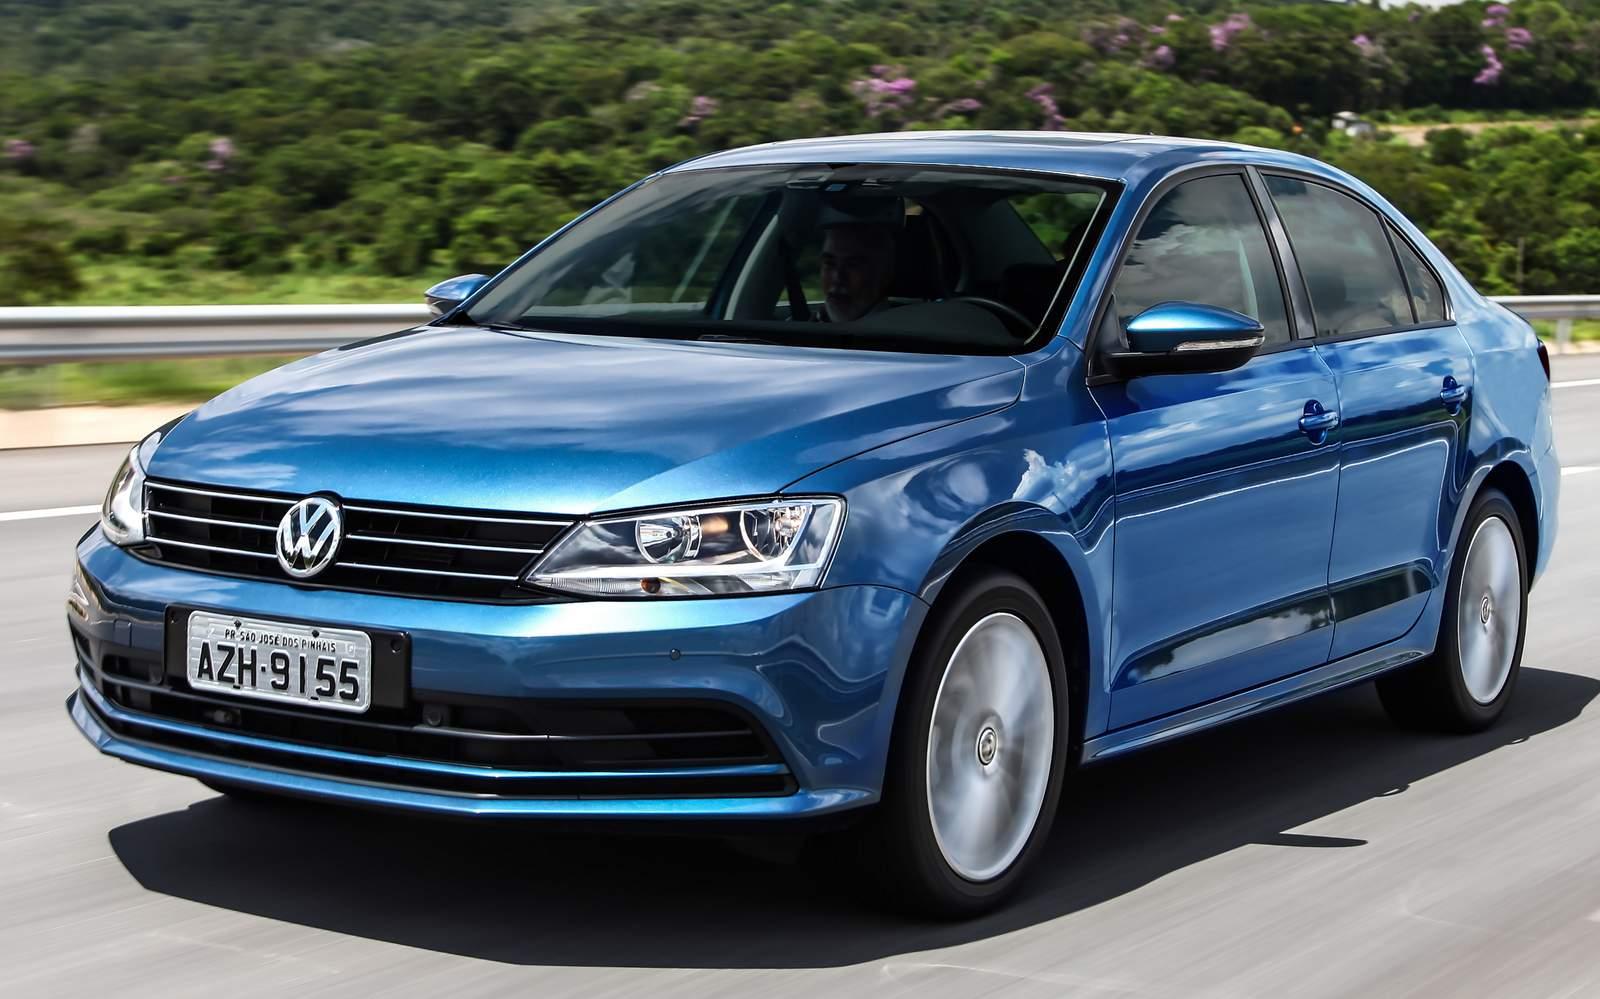 VW Jetta 2018 - tabela de preços